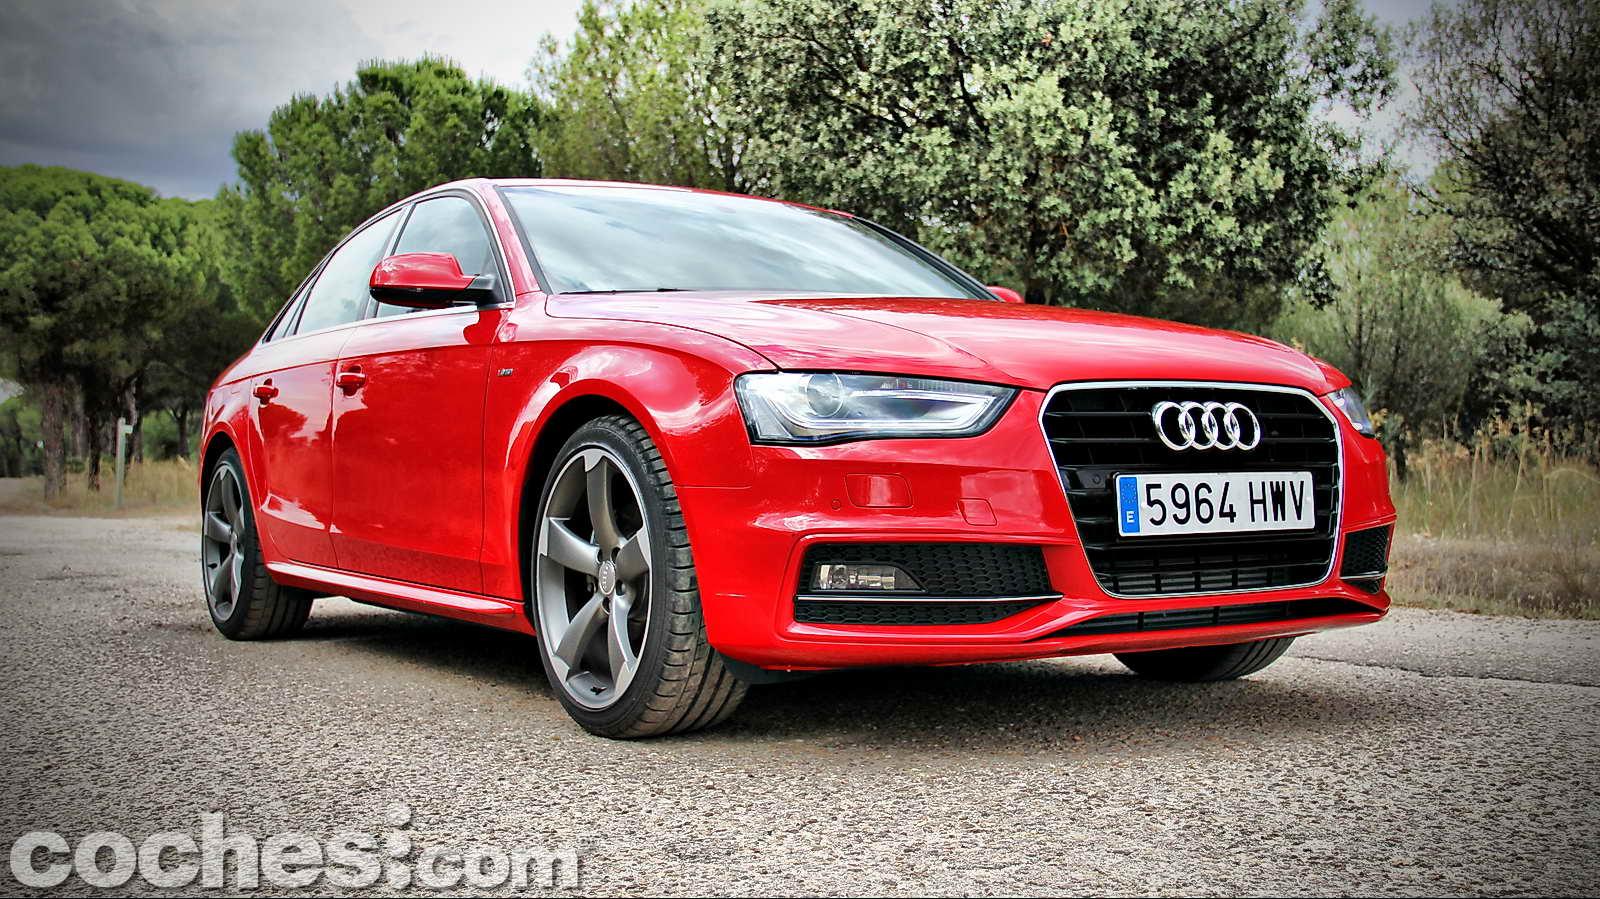 Audi_A4_2.0_TDI_Multitronic_01